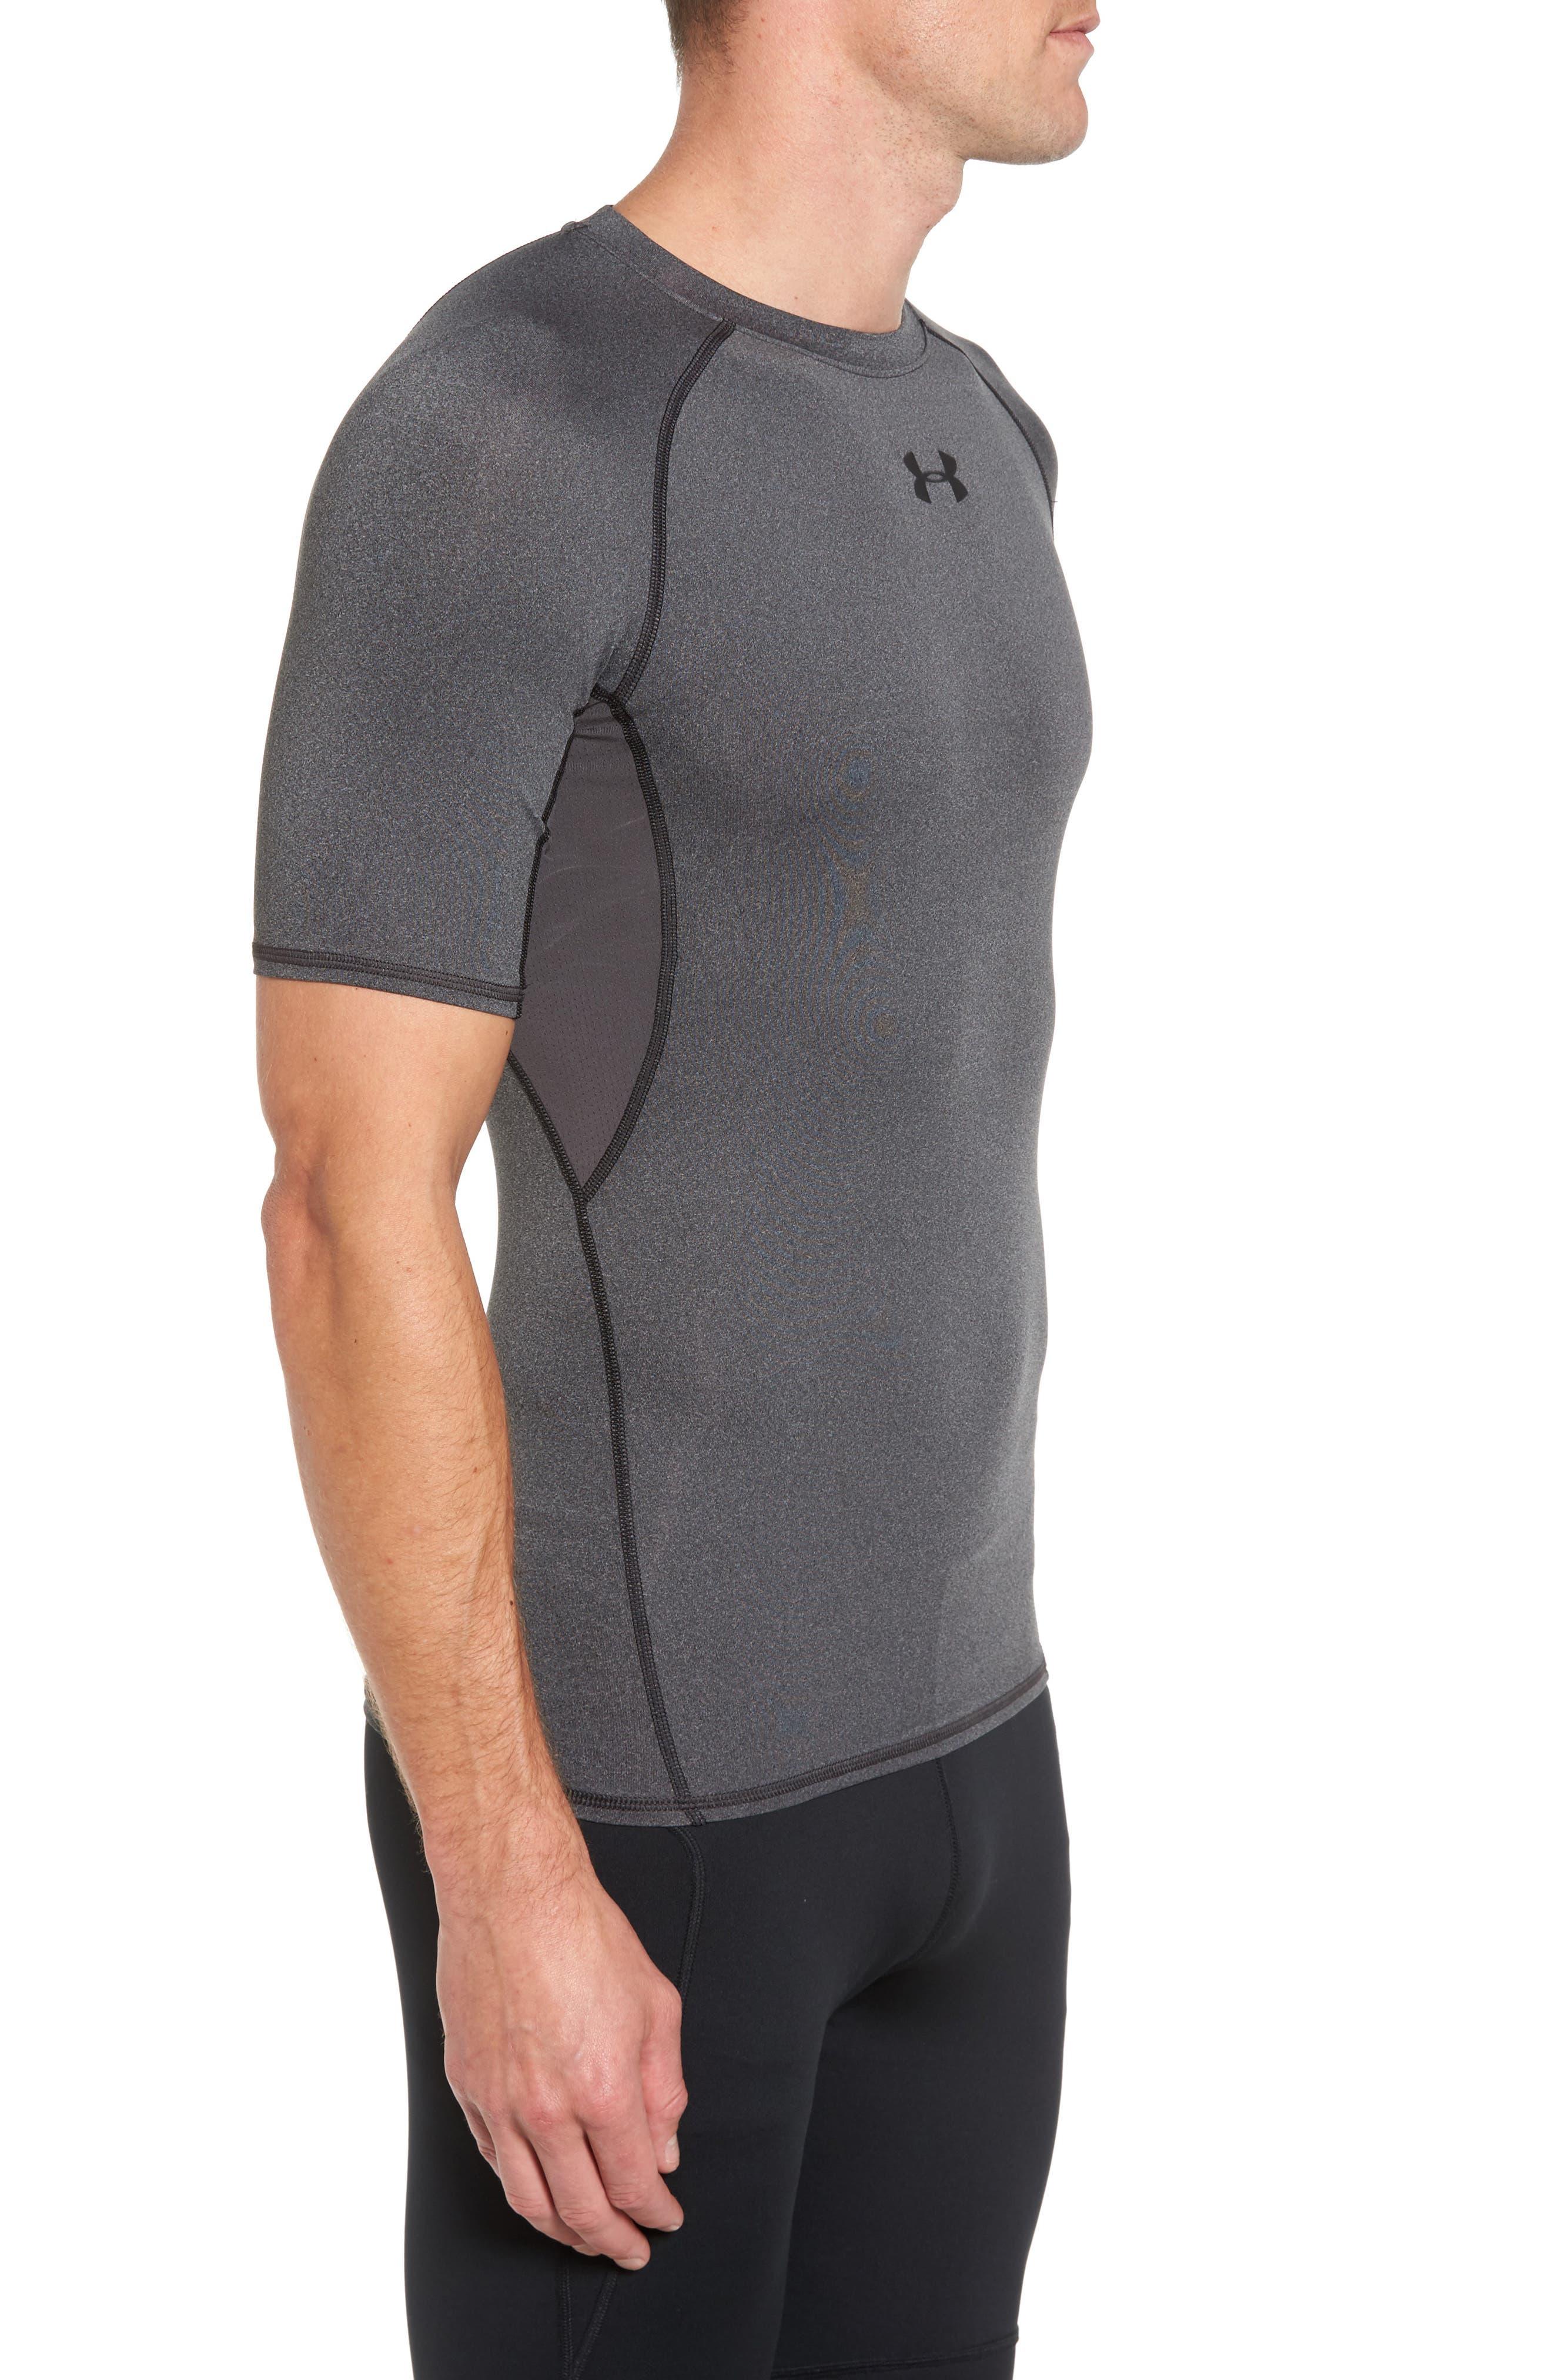 HeatGear<sup>®</sup> Compression Fit T-Shirt,                             Alternate thumbnail 4, color,                             CARBON HEATHER/ BLACK